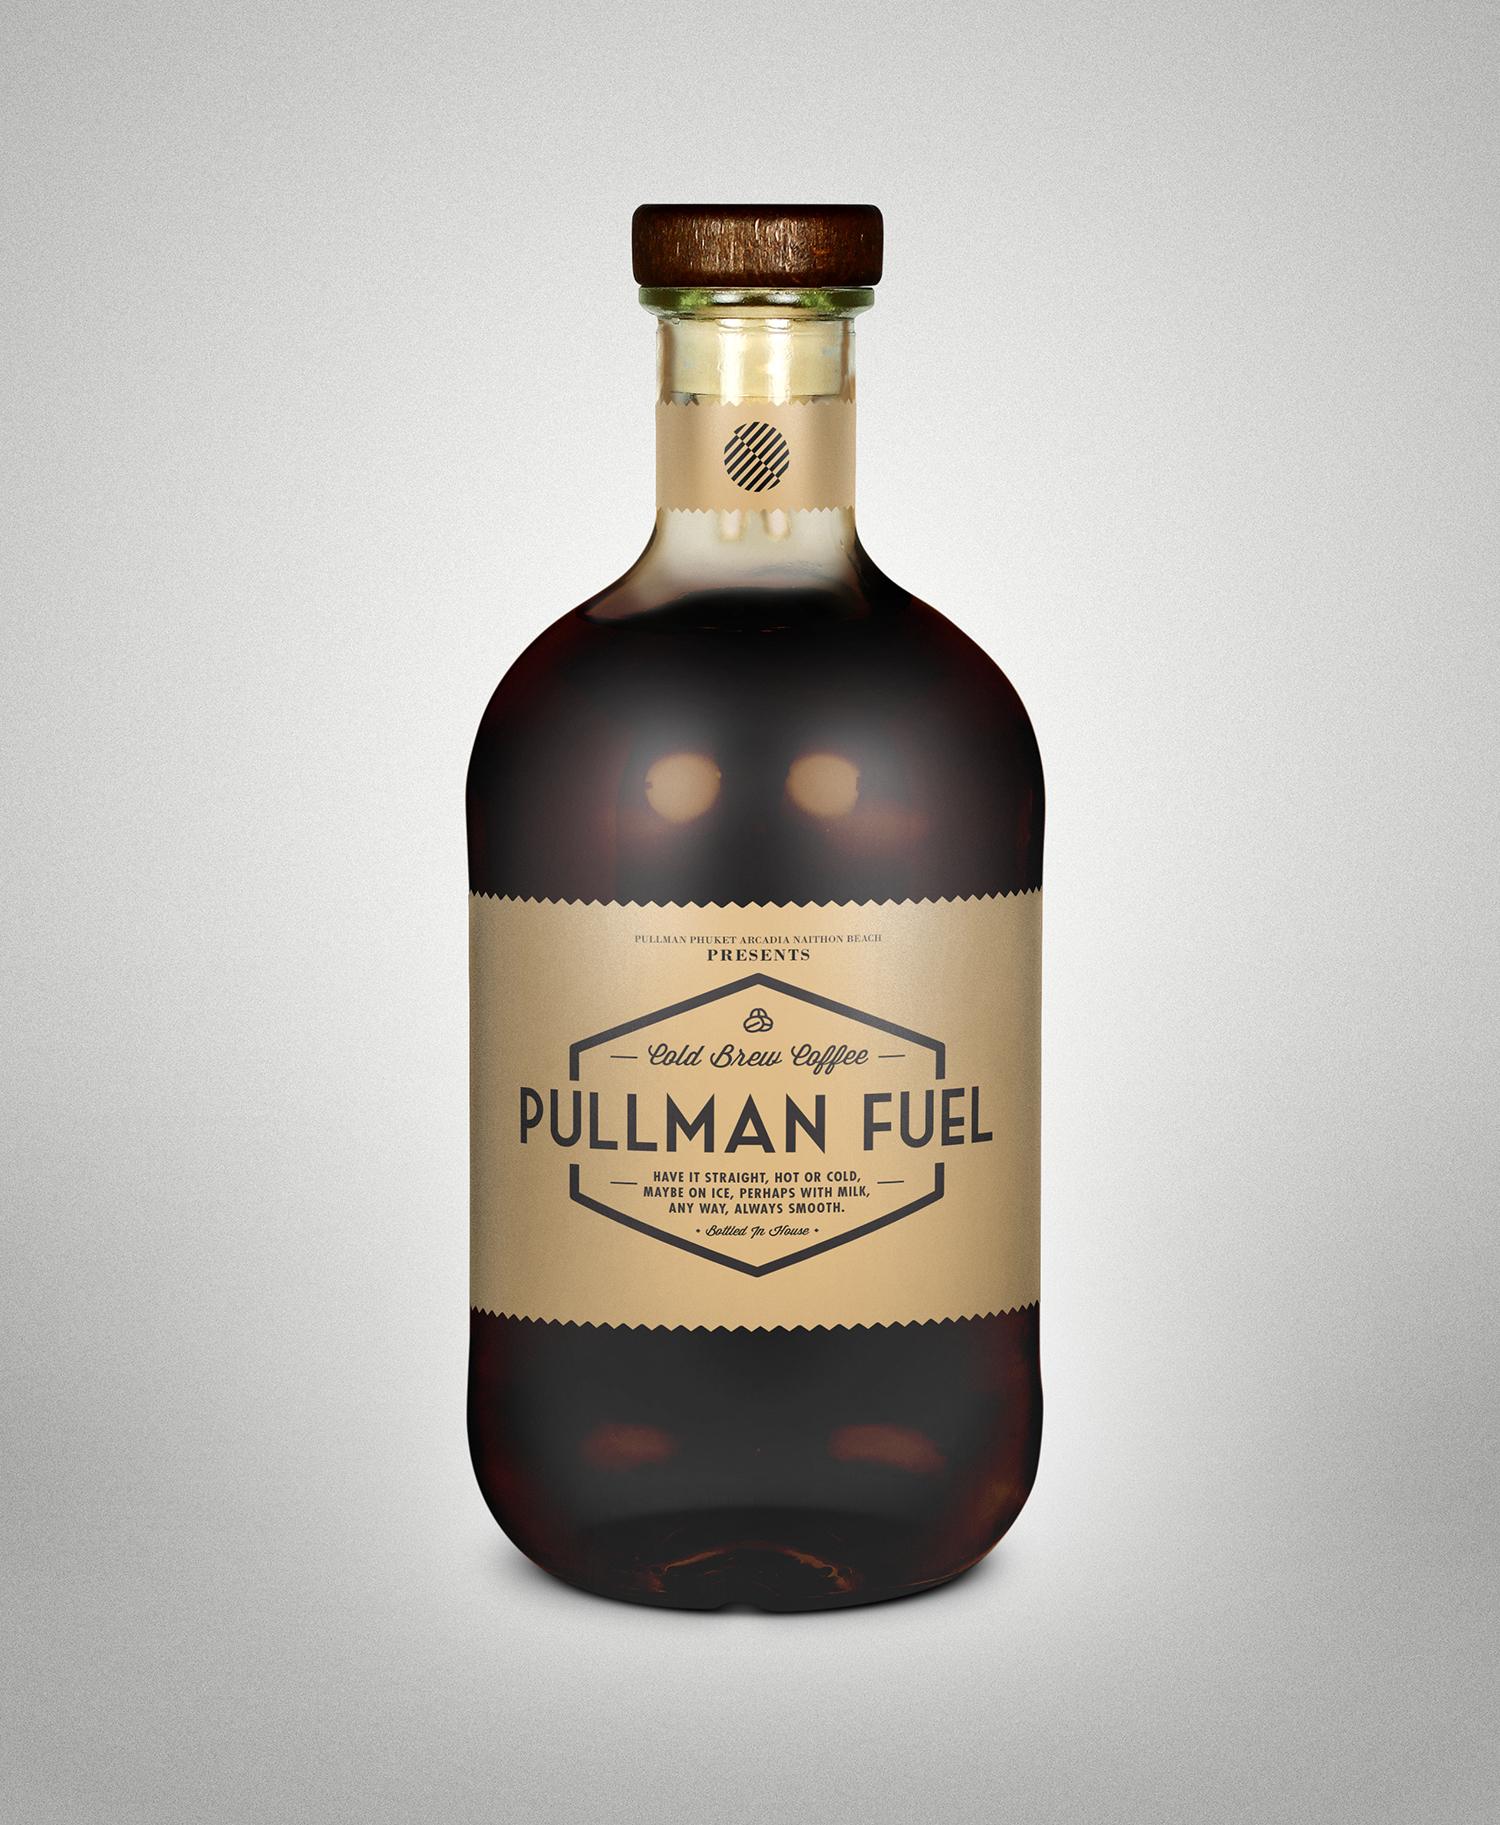 bespoke product design - PULLMAN RESORTS COLD BREW COFFEE